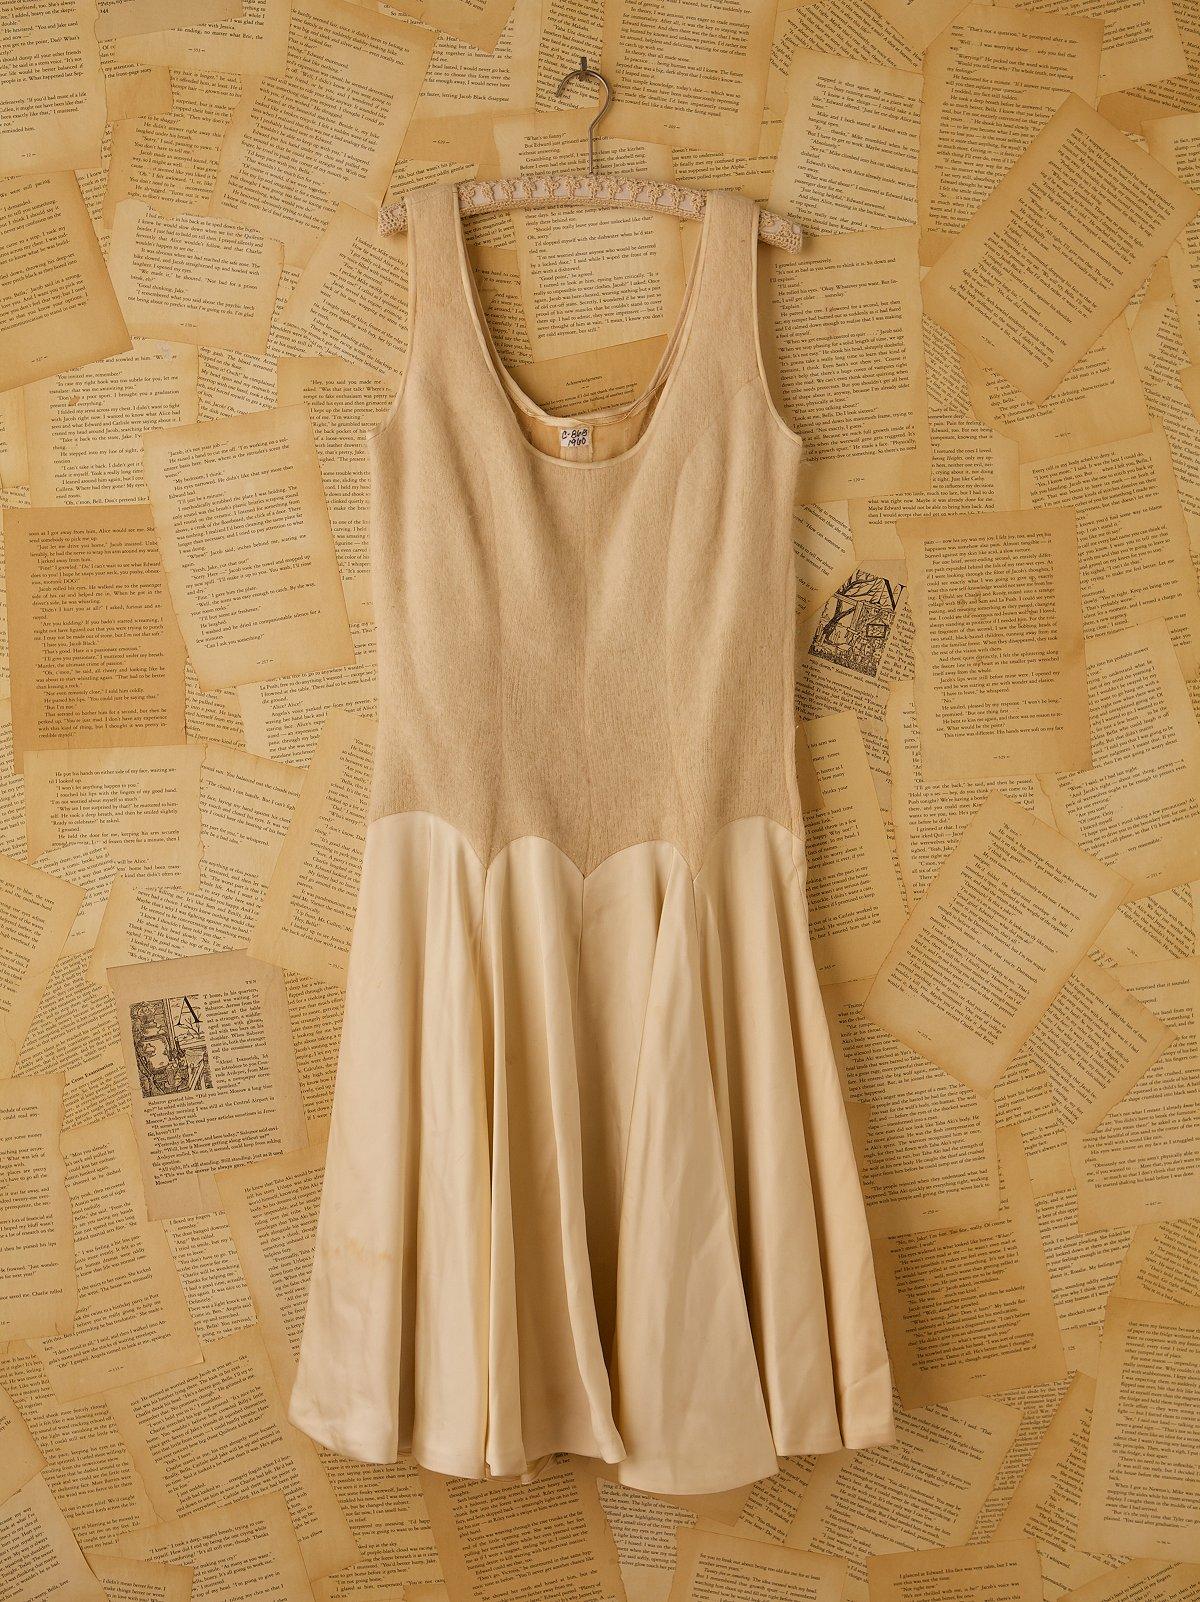 Vintage Cream Angora and Satin Dress